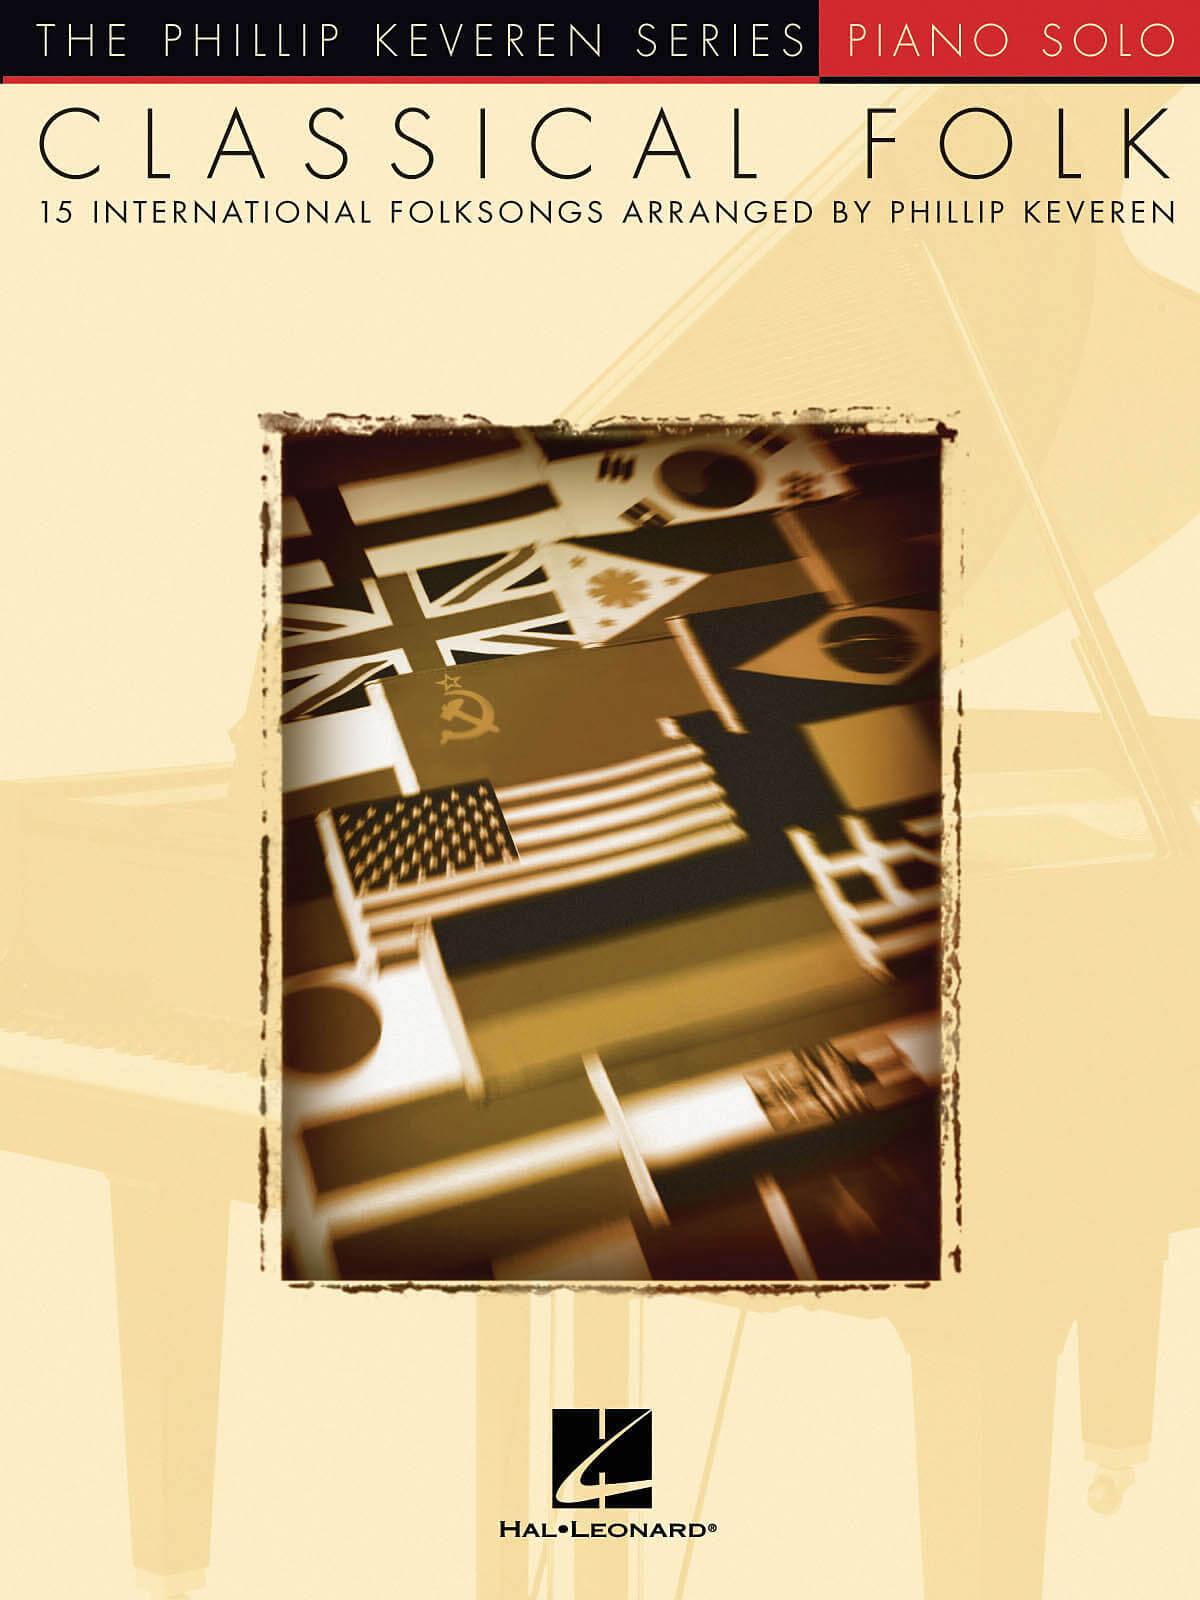 Classical Folk - 15 International Folksongs